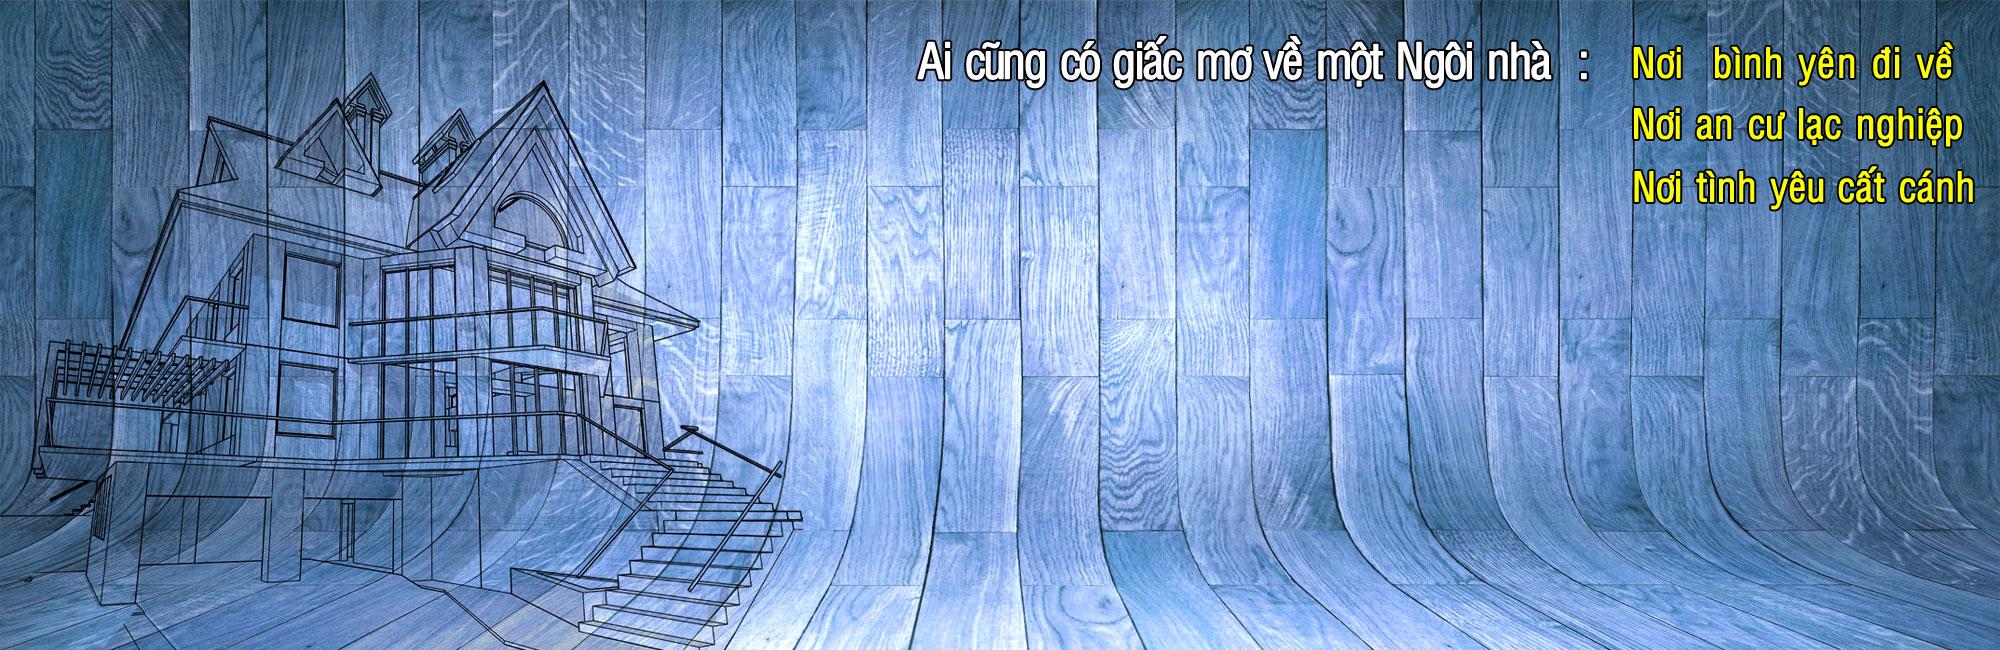 baner -1ba